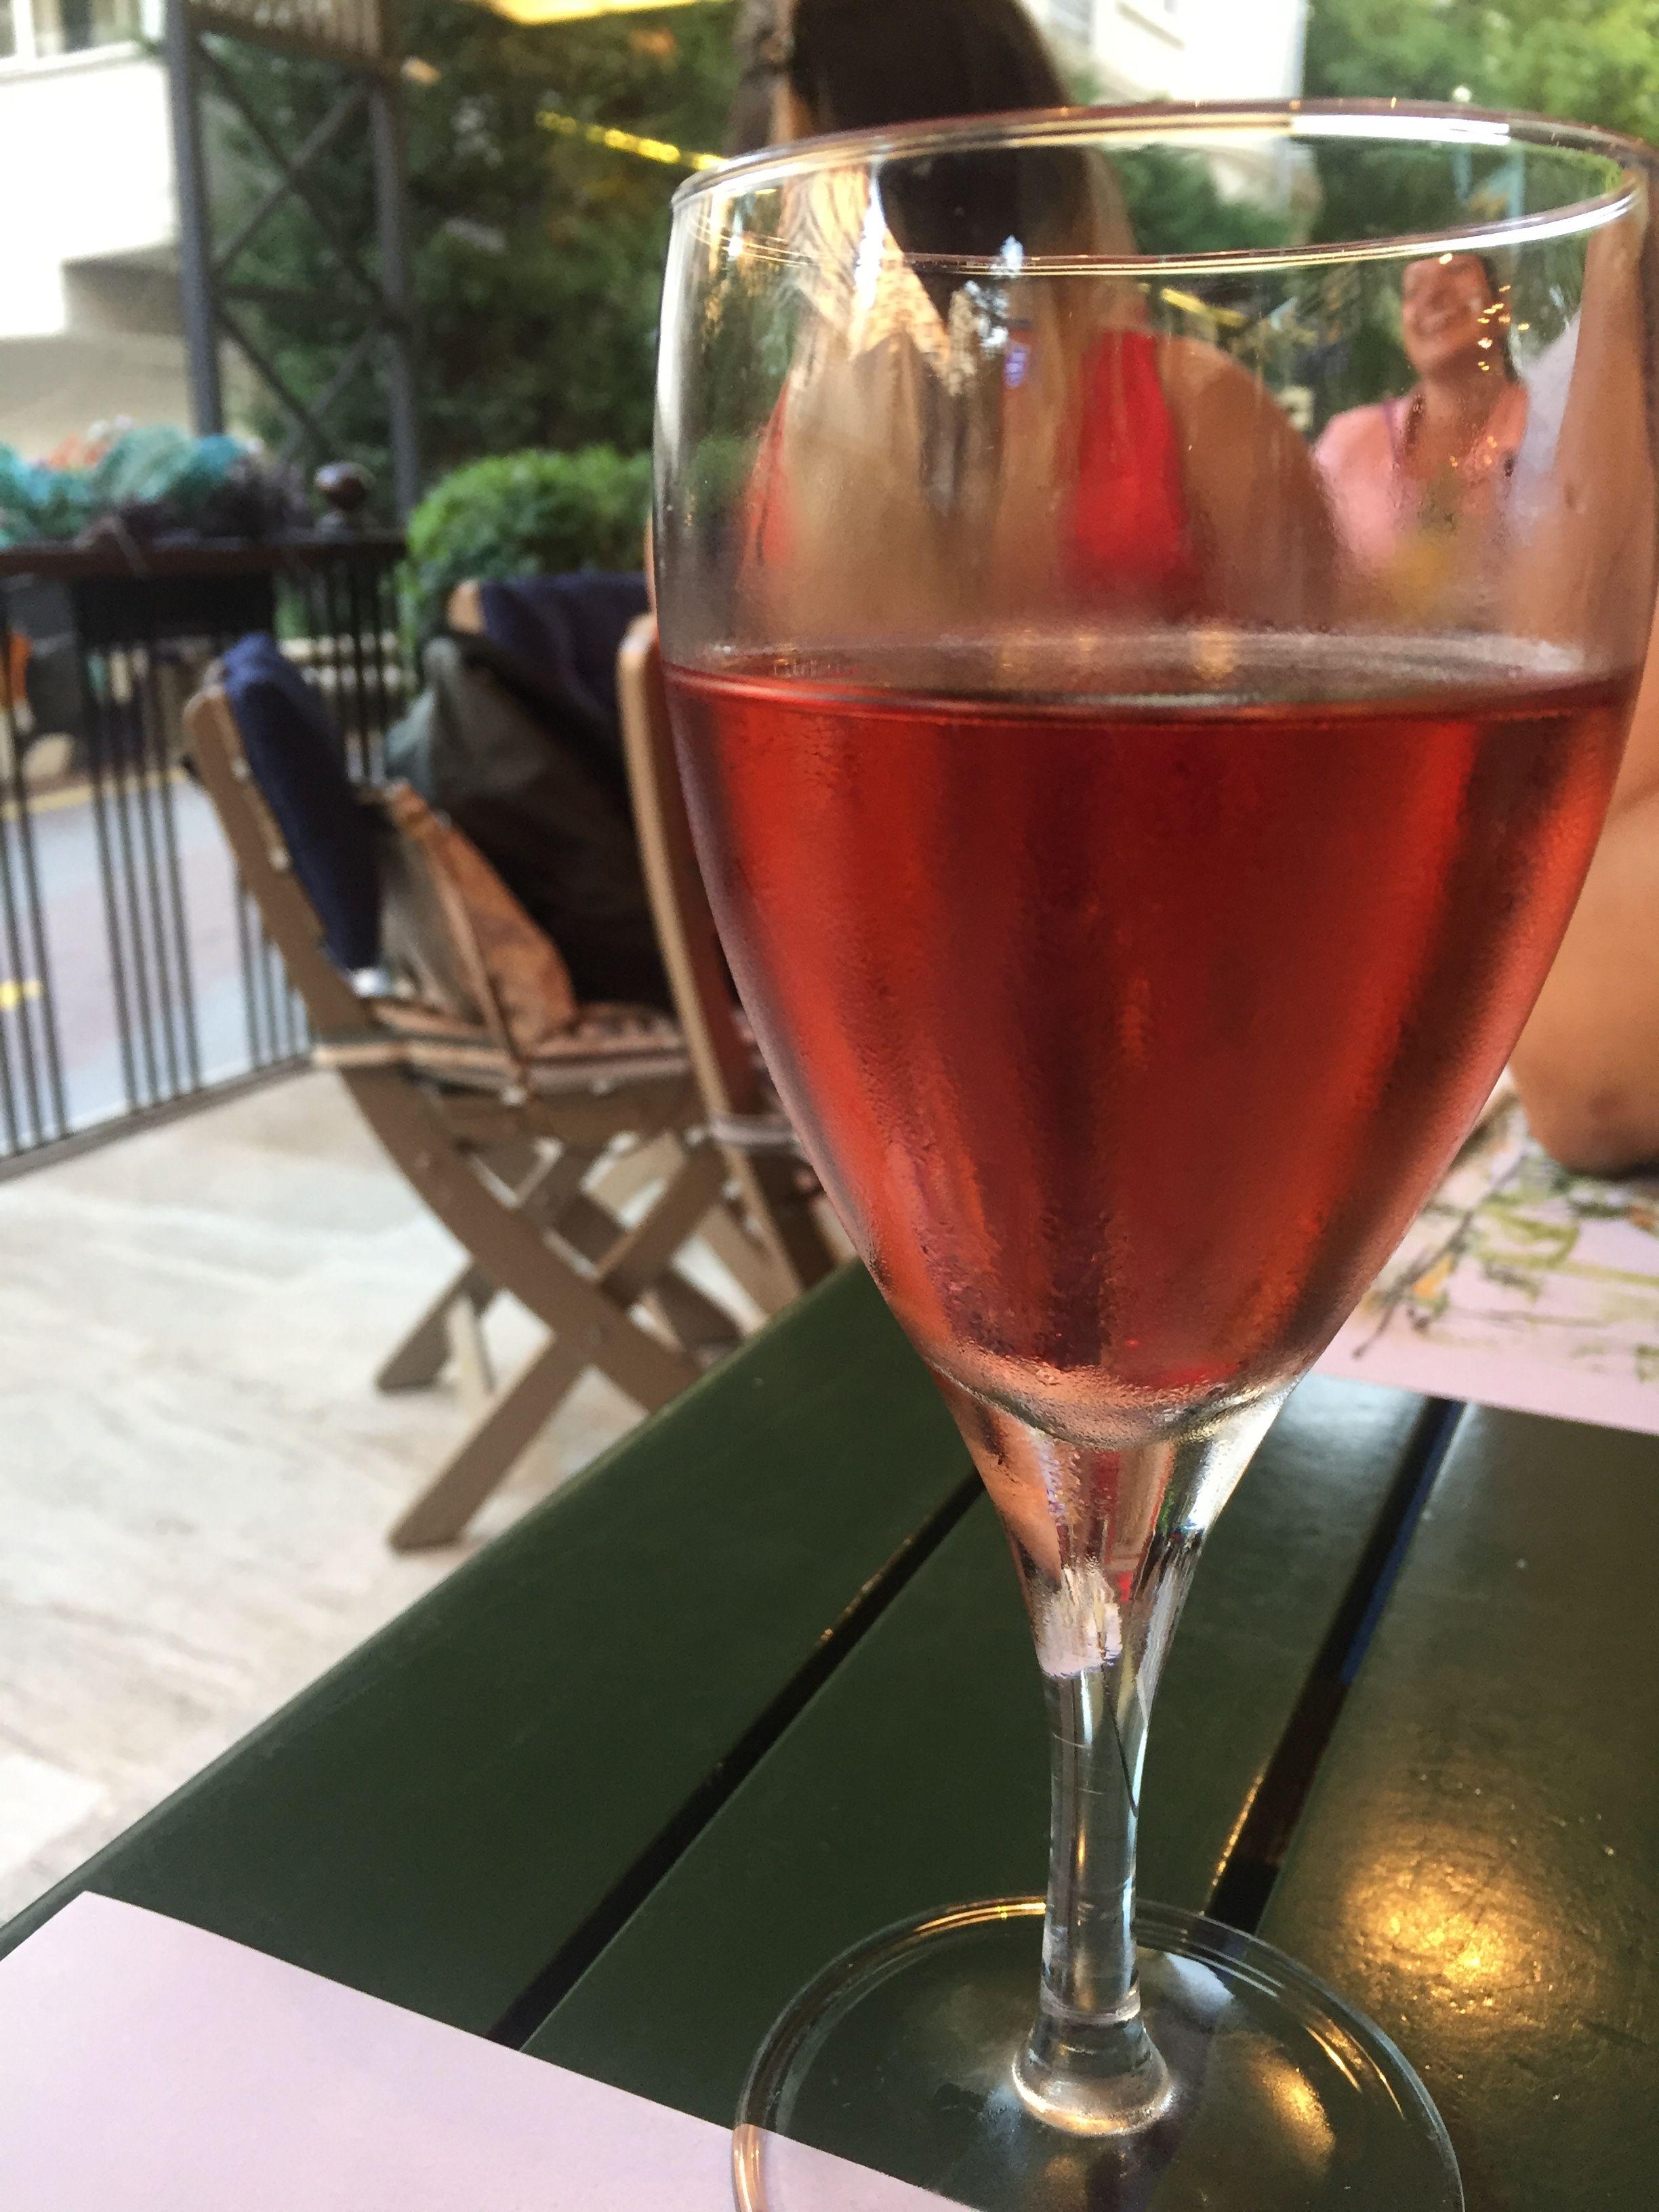 Frontera Merlot Rose Chile Pretty Drinks Drinks Rose Wine